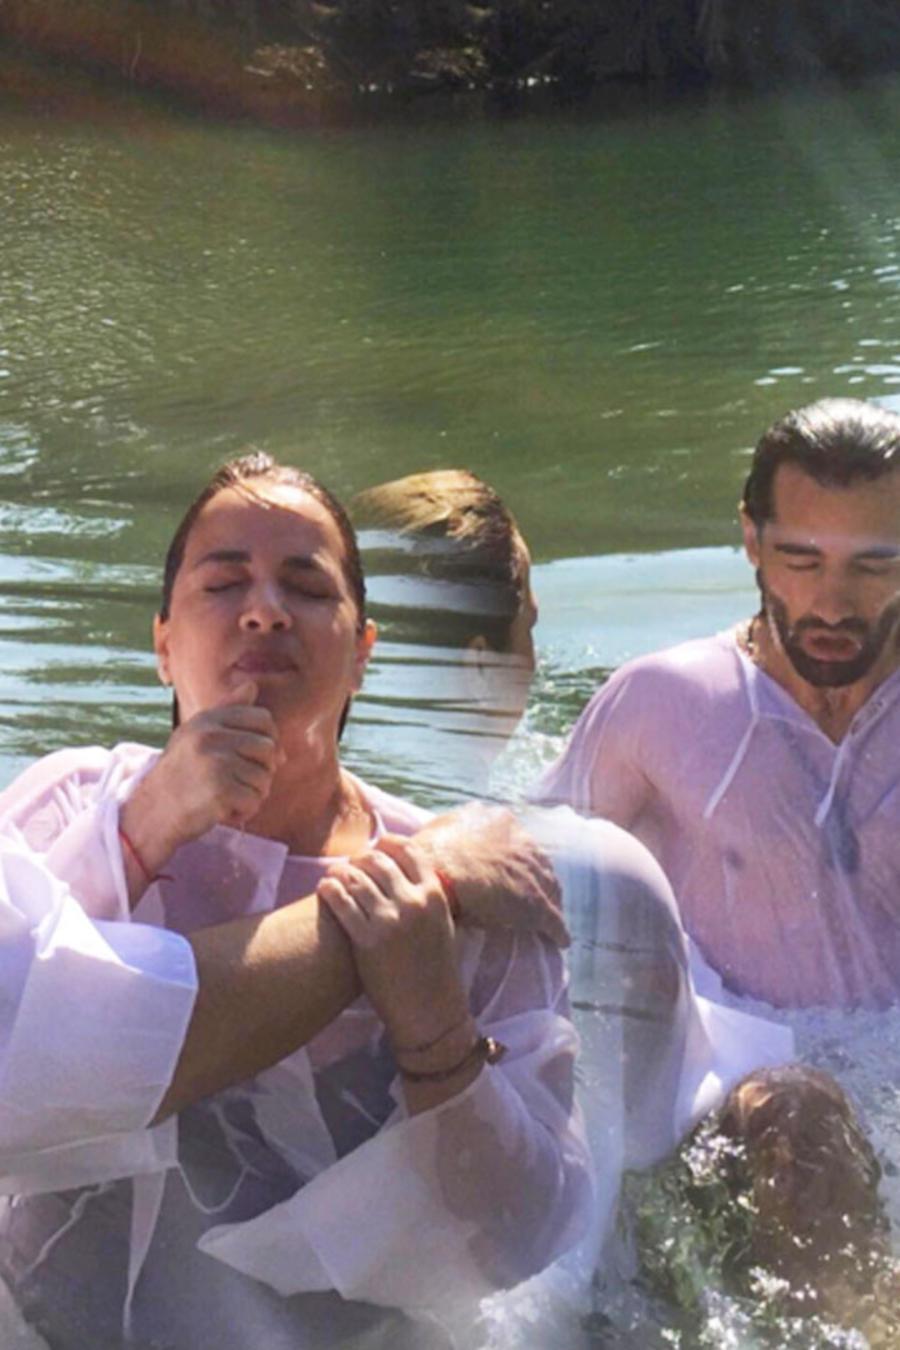 adamari y toni costa se bautizan